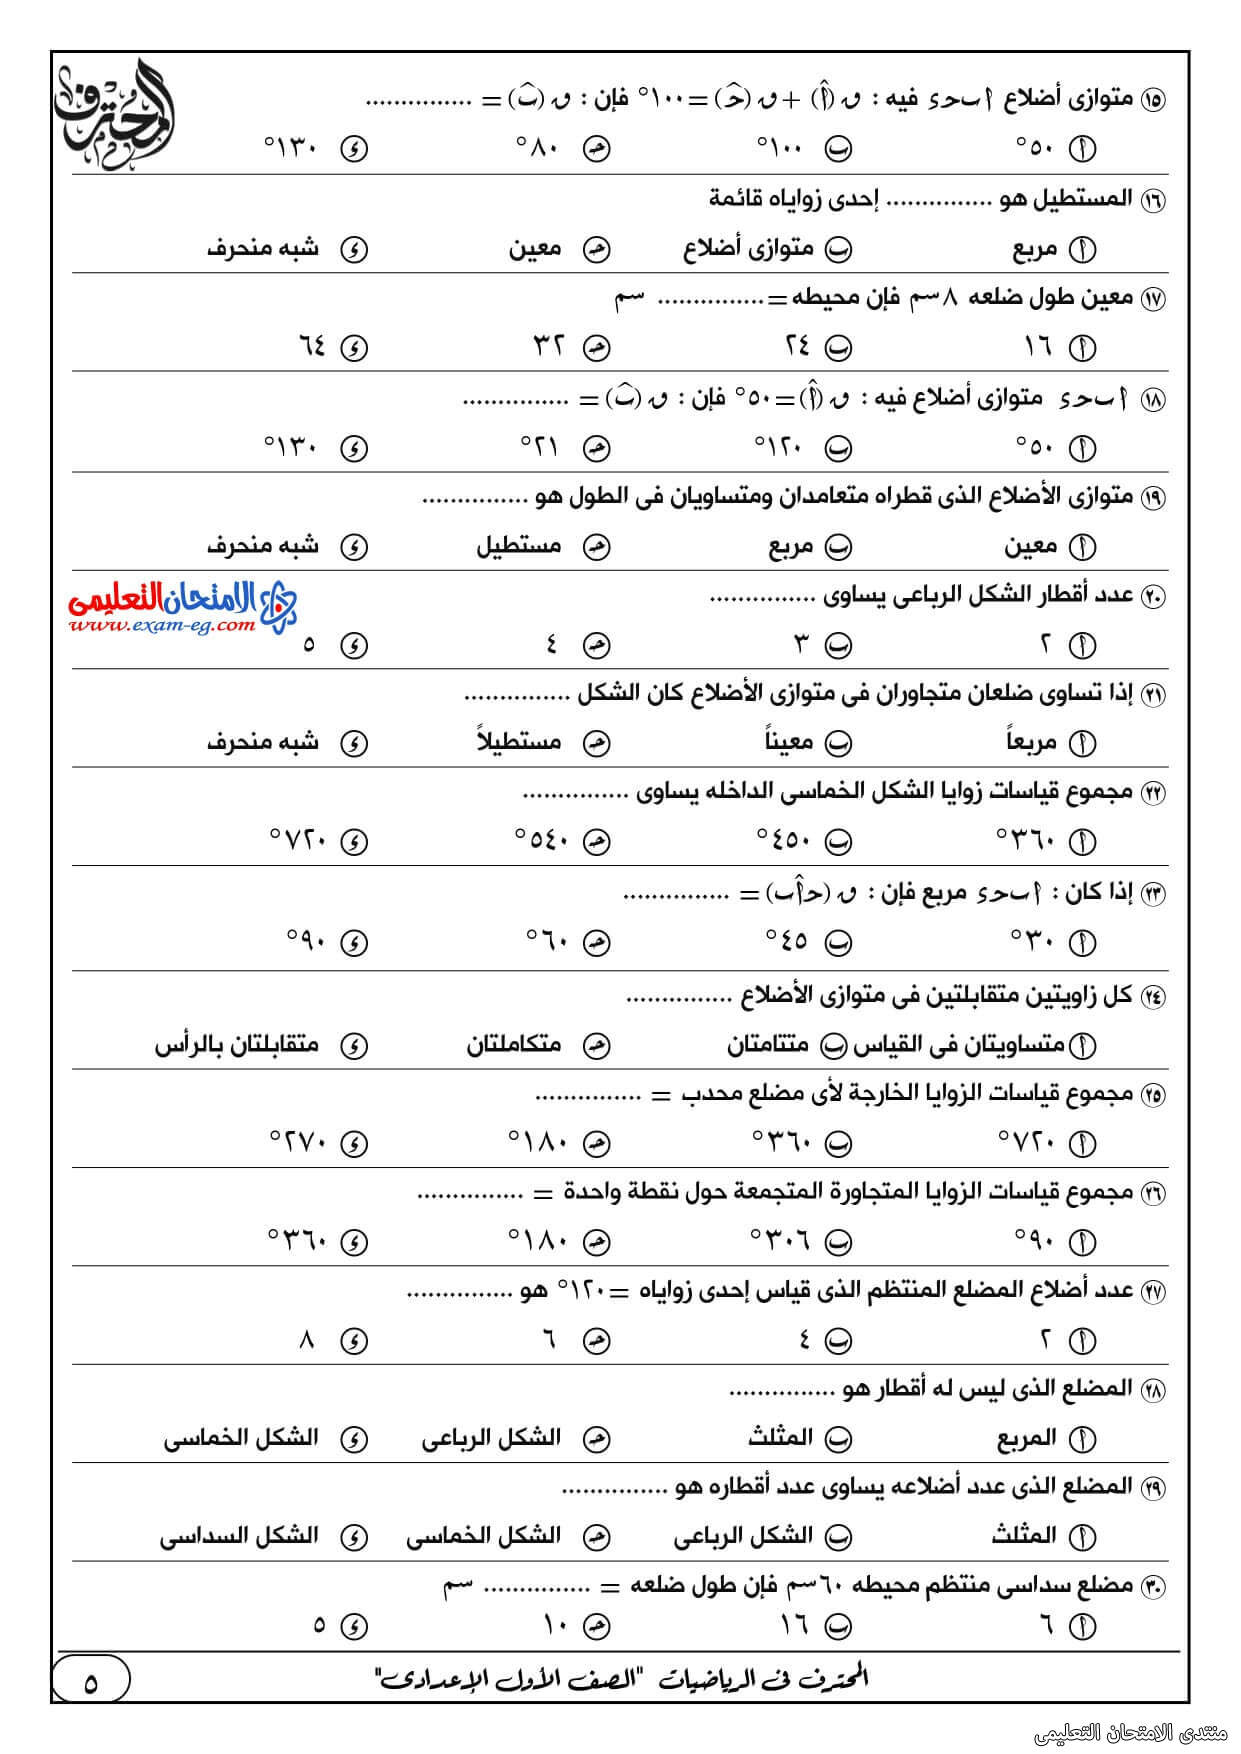 exam-eg.com_161688555030816.jpg